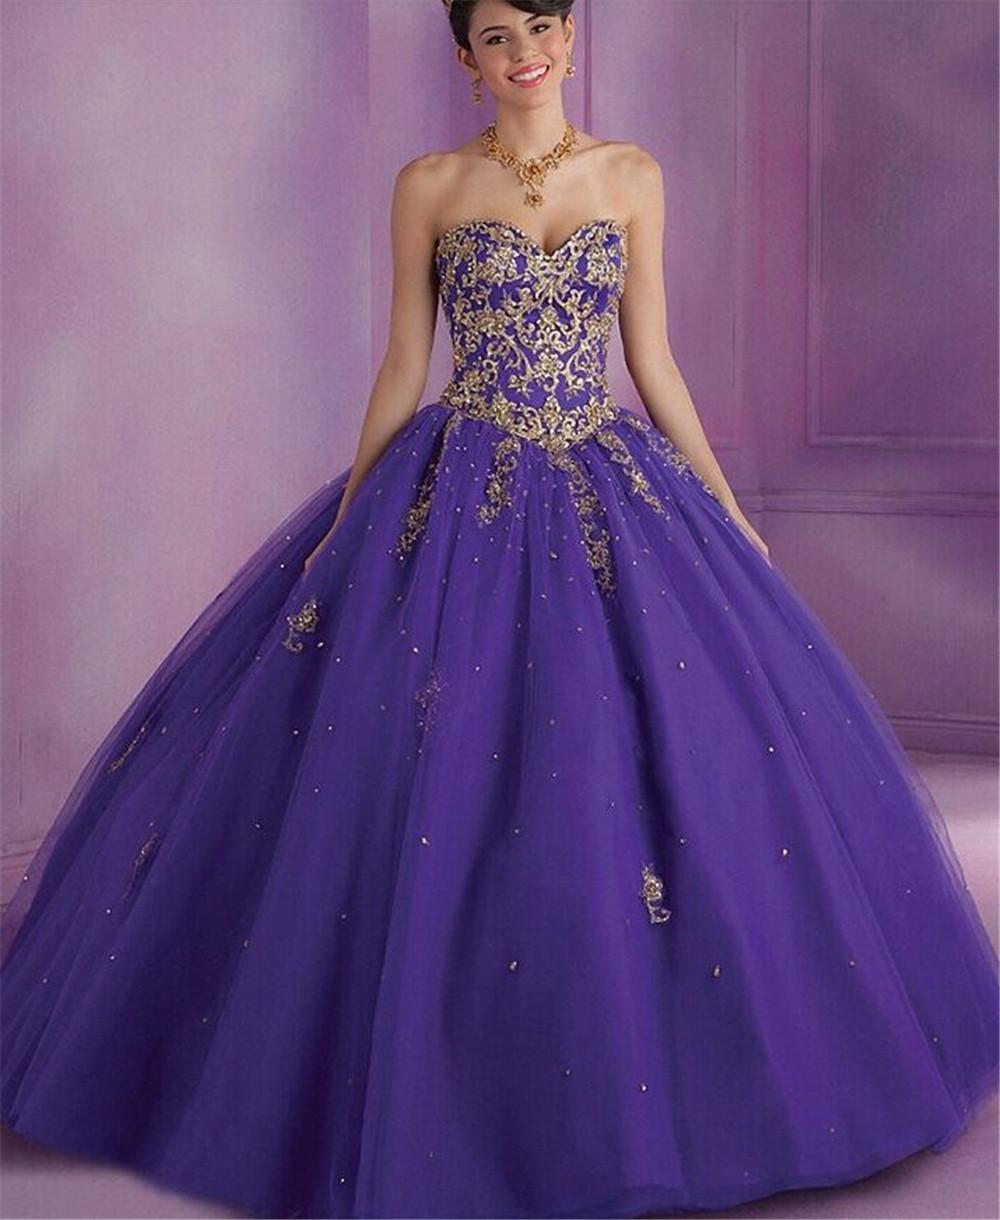 Excepcional Vestido De Novia De La Princesa Ariel Viñeta - Vestido ...